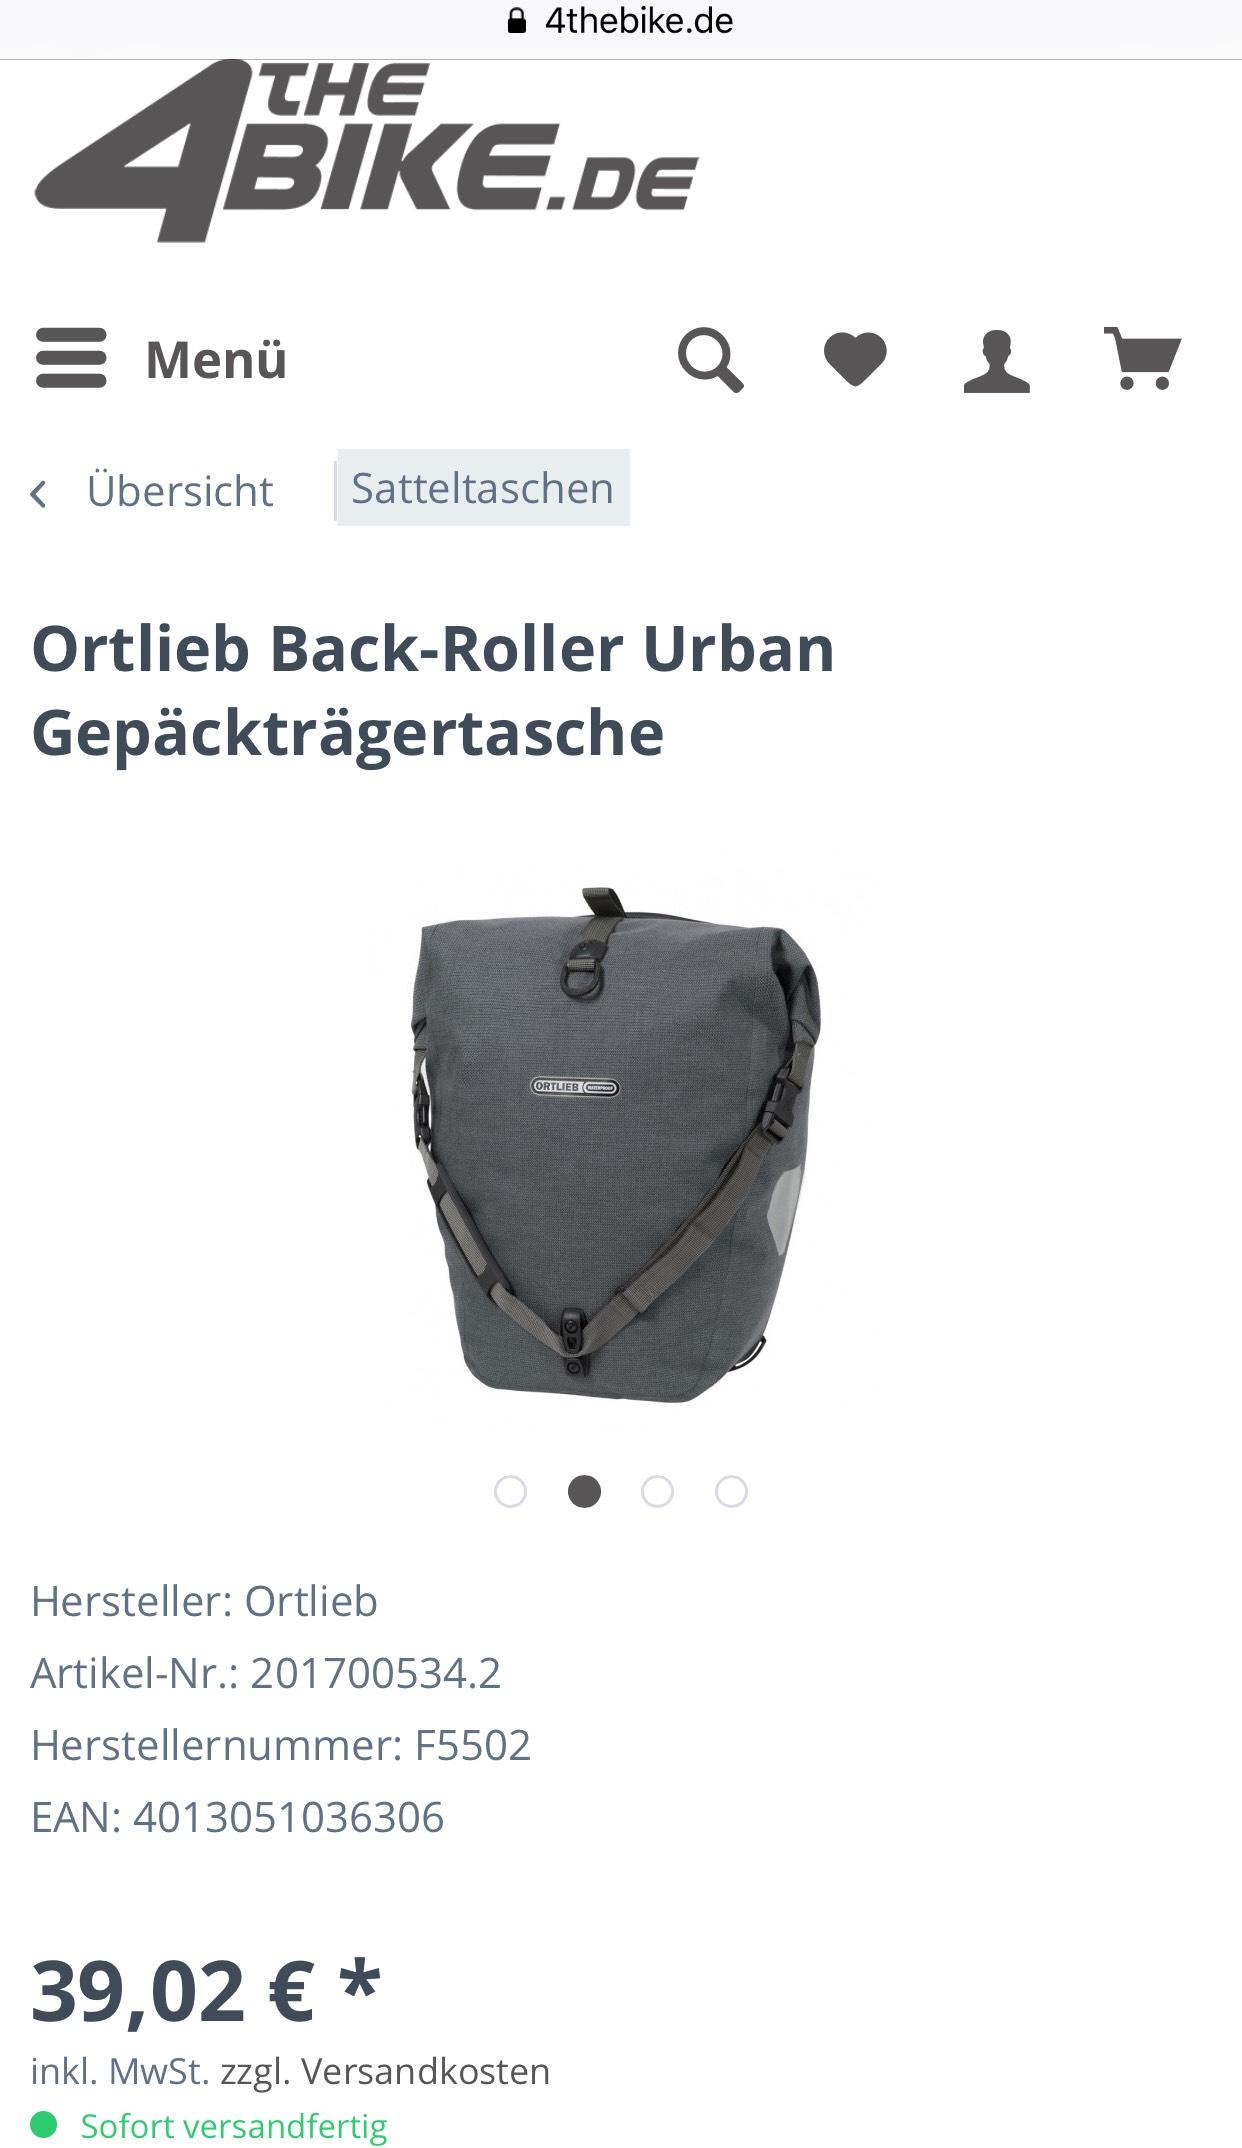 Ortlieb Back-Roller Urban QL2.1 in Pepper Gepäckträgertasche